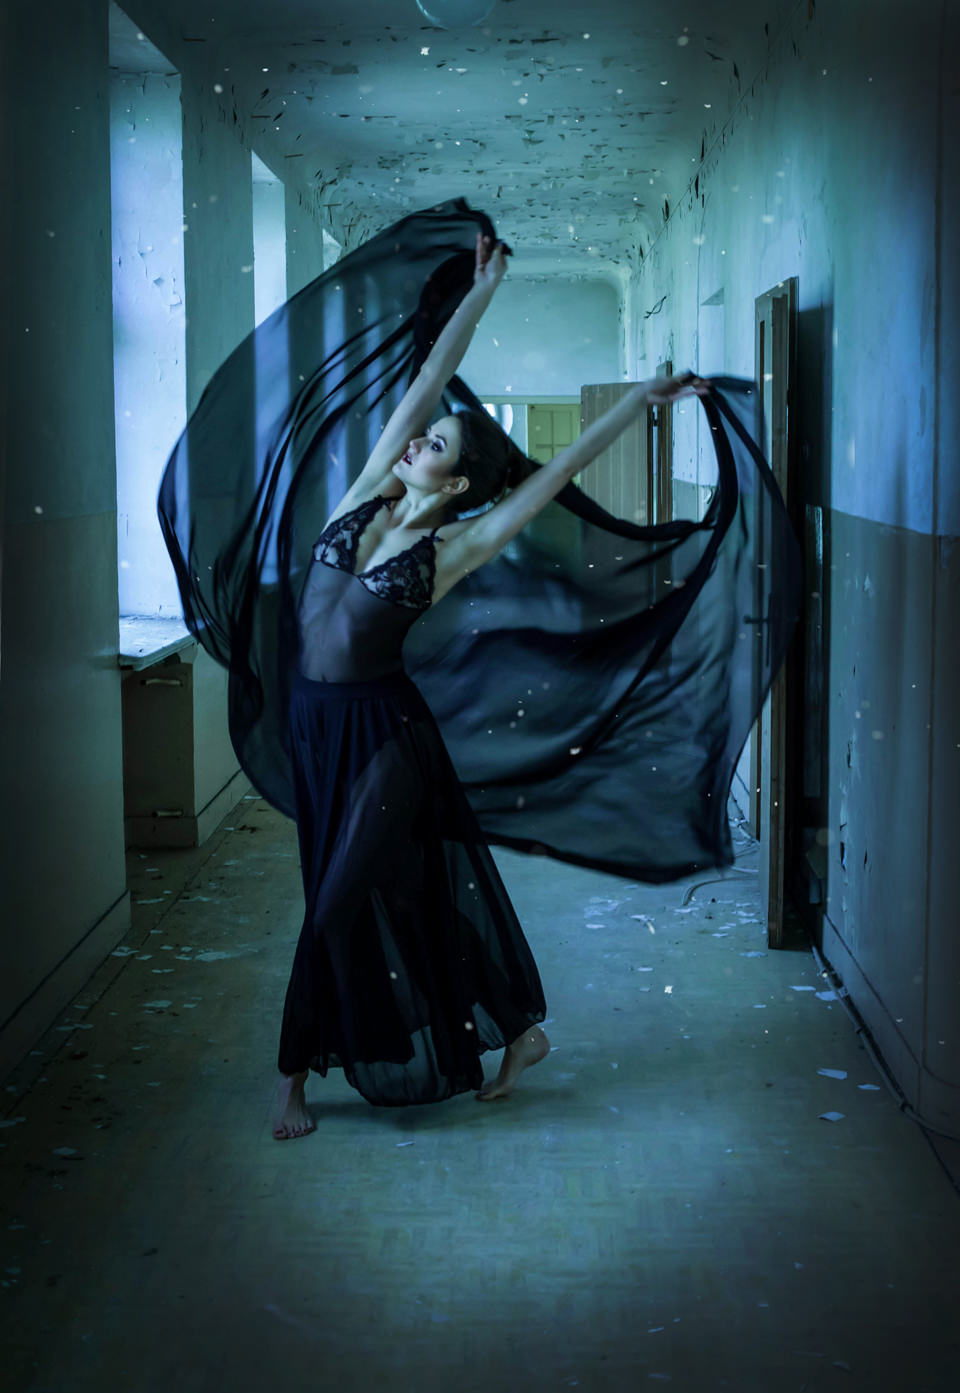 DANCE Shooting - Fotoshooting - LATE NIGHT TALES Photography Christina Bulka Fotograf / Fotografie